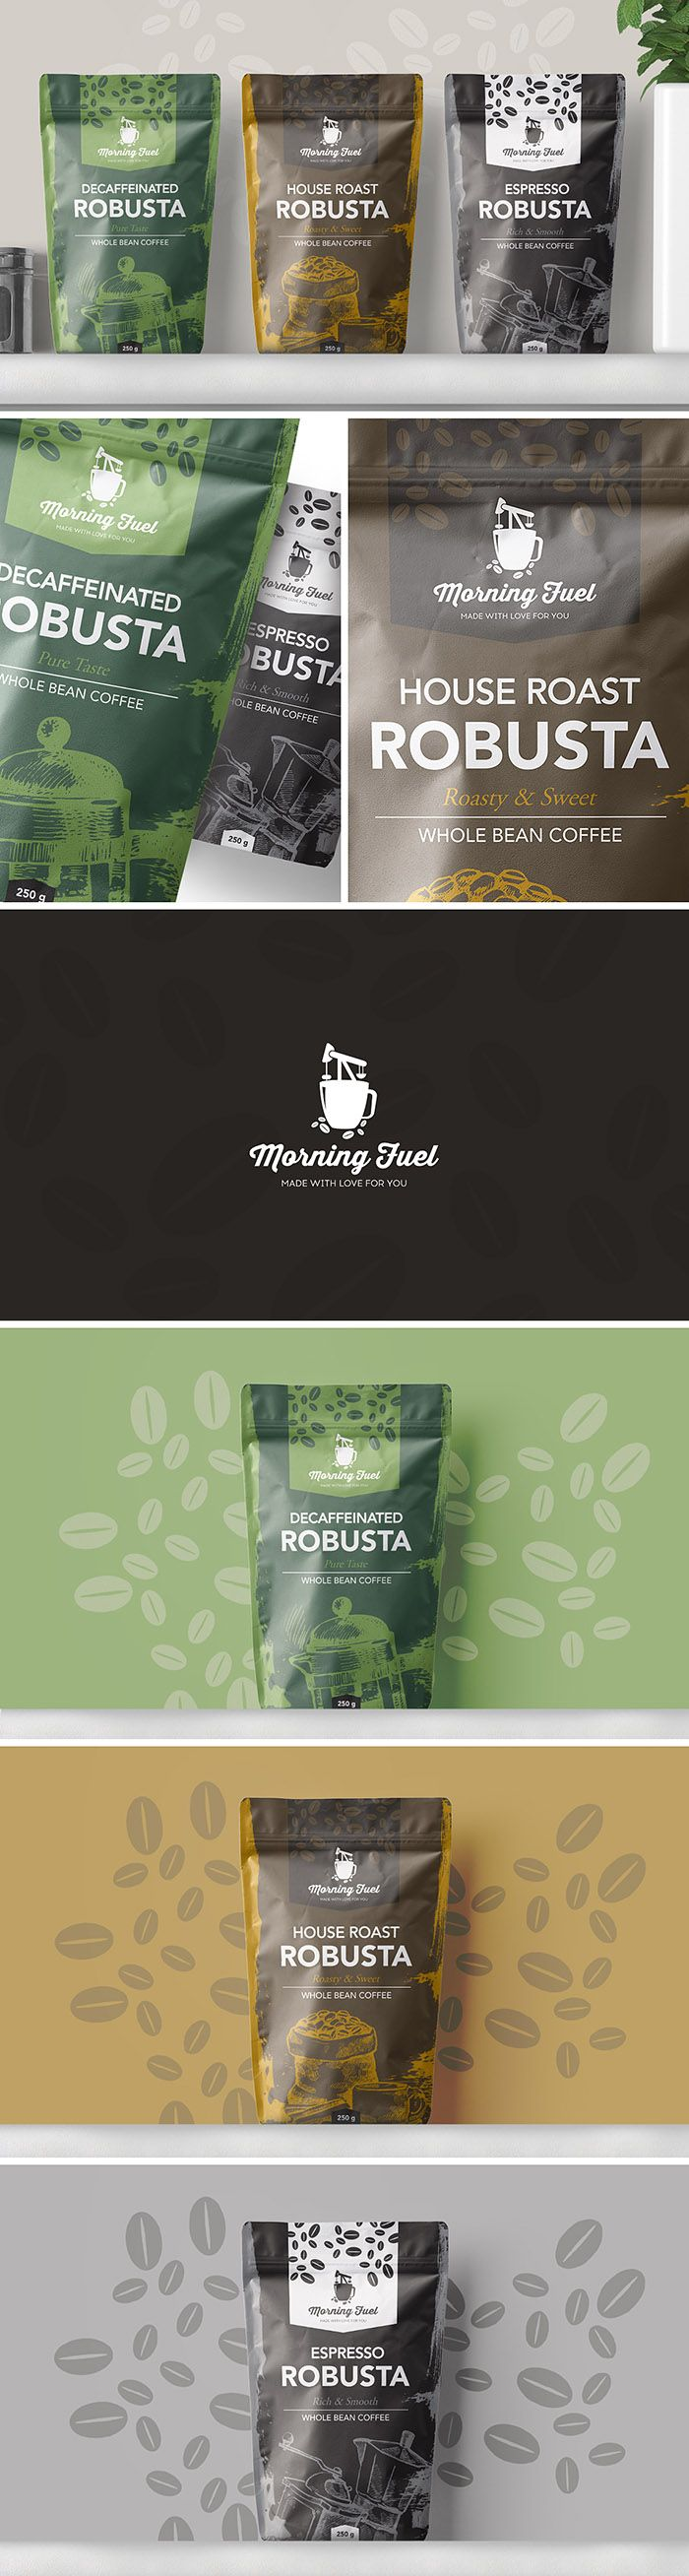 Morning Fuel Coffee